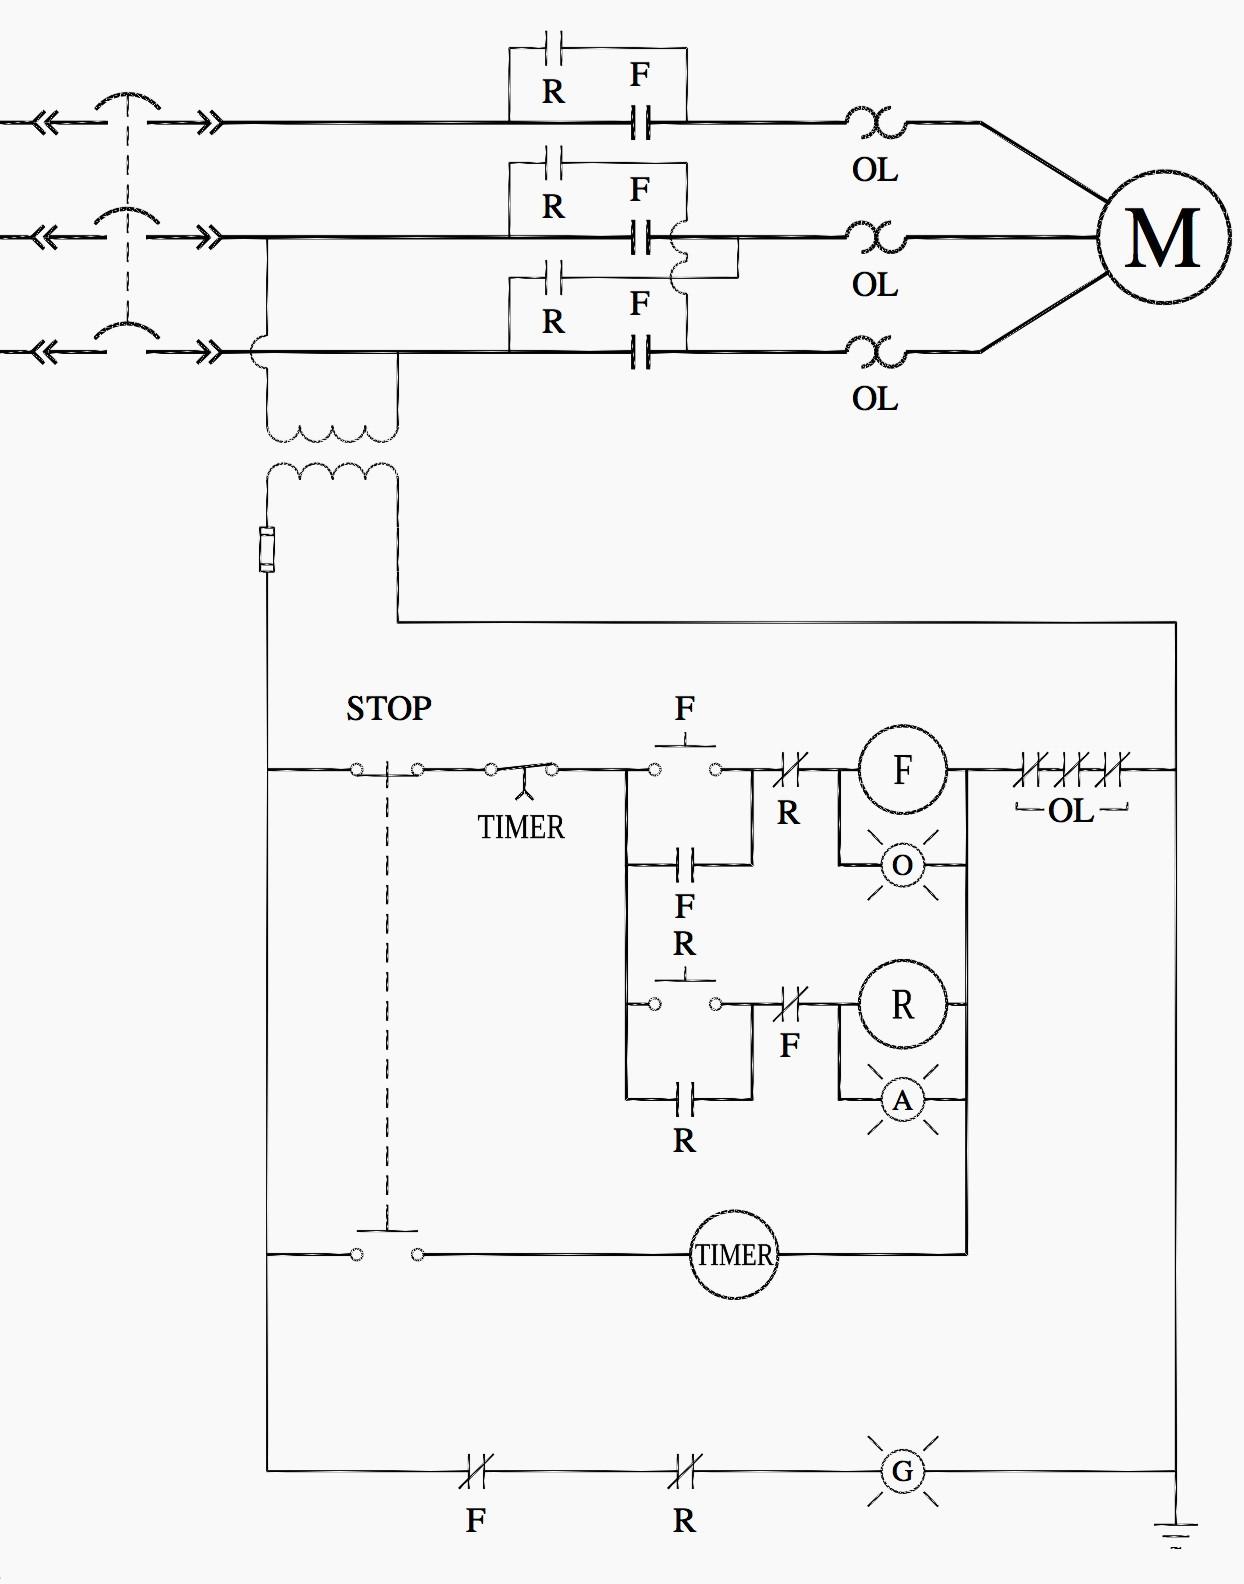 hight resolution of motor starter wiring diagram start stop relay ladder wiring diagram inspirationa motor starter wiring diagram